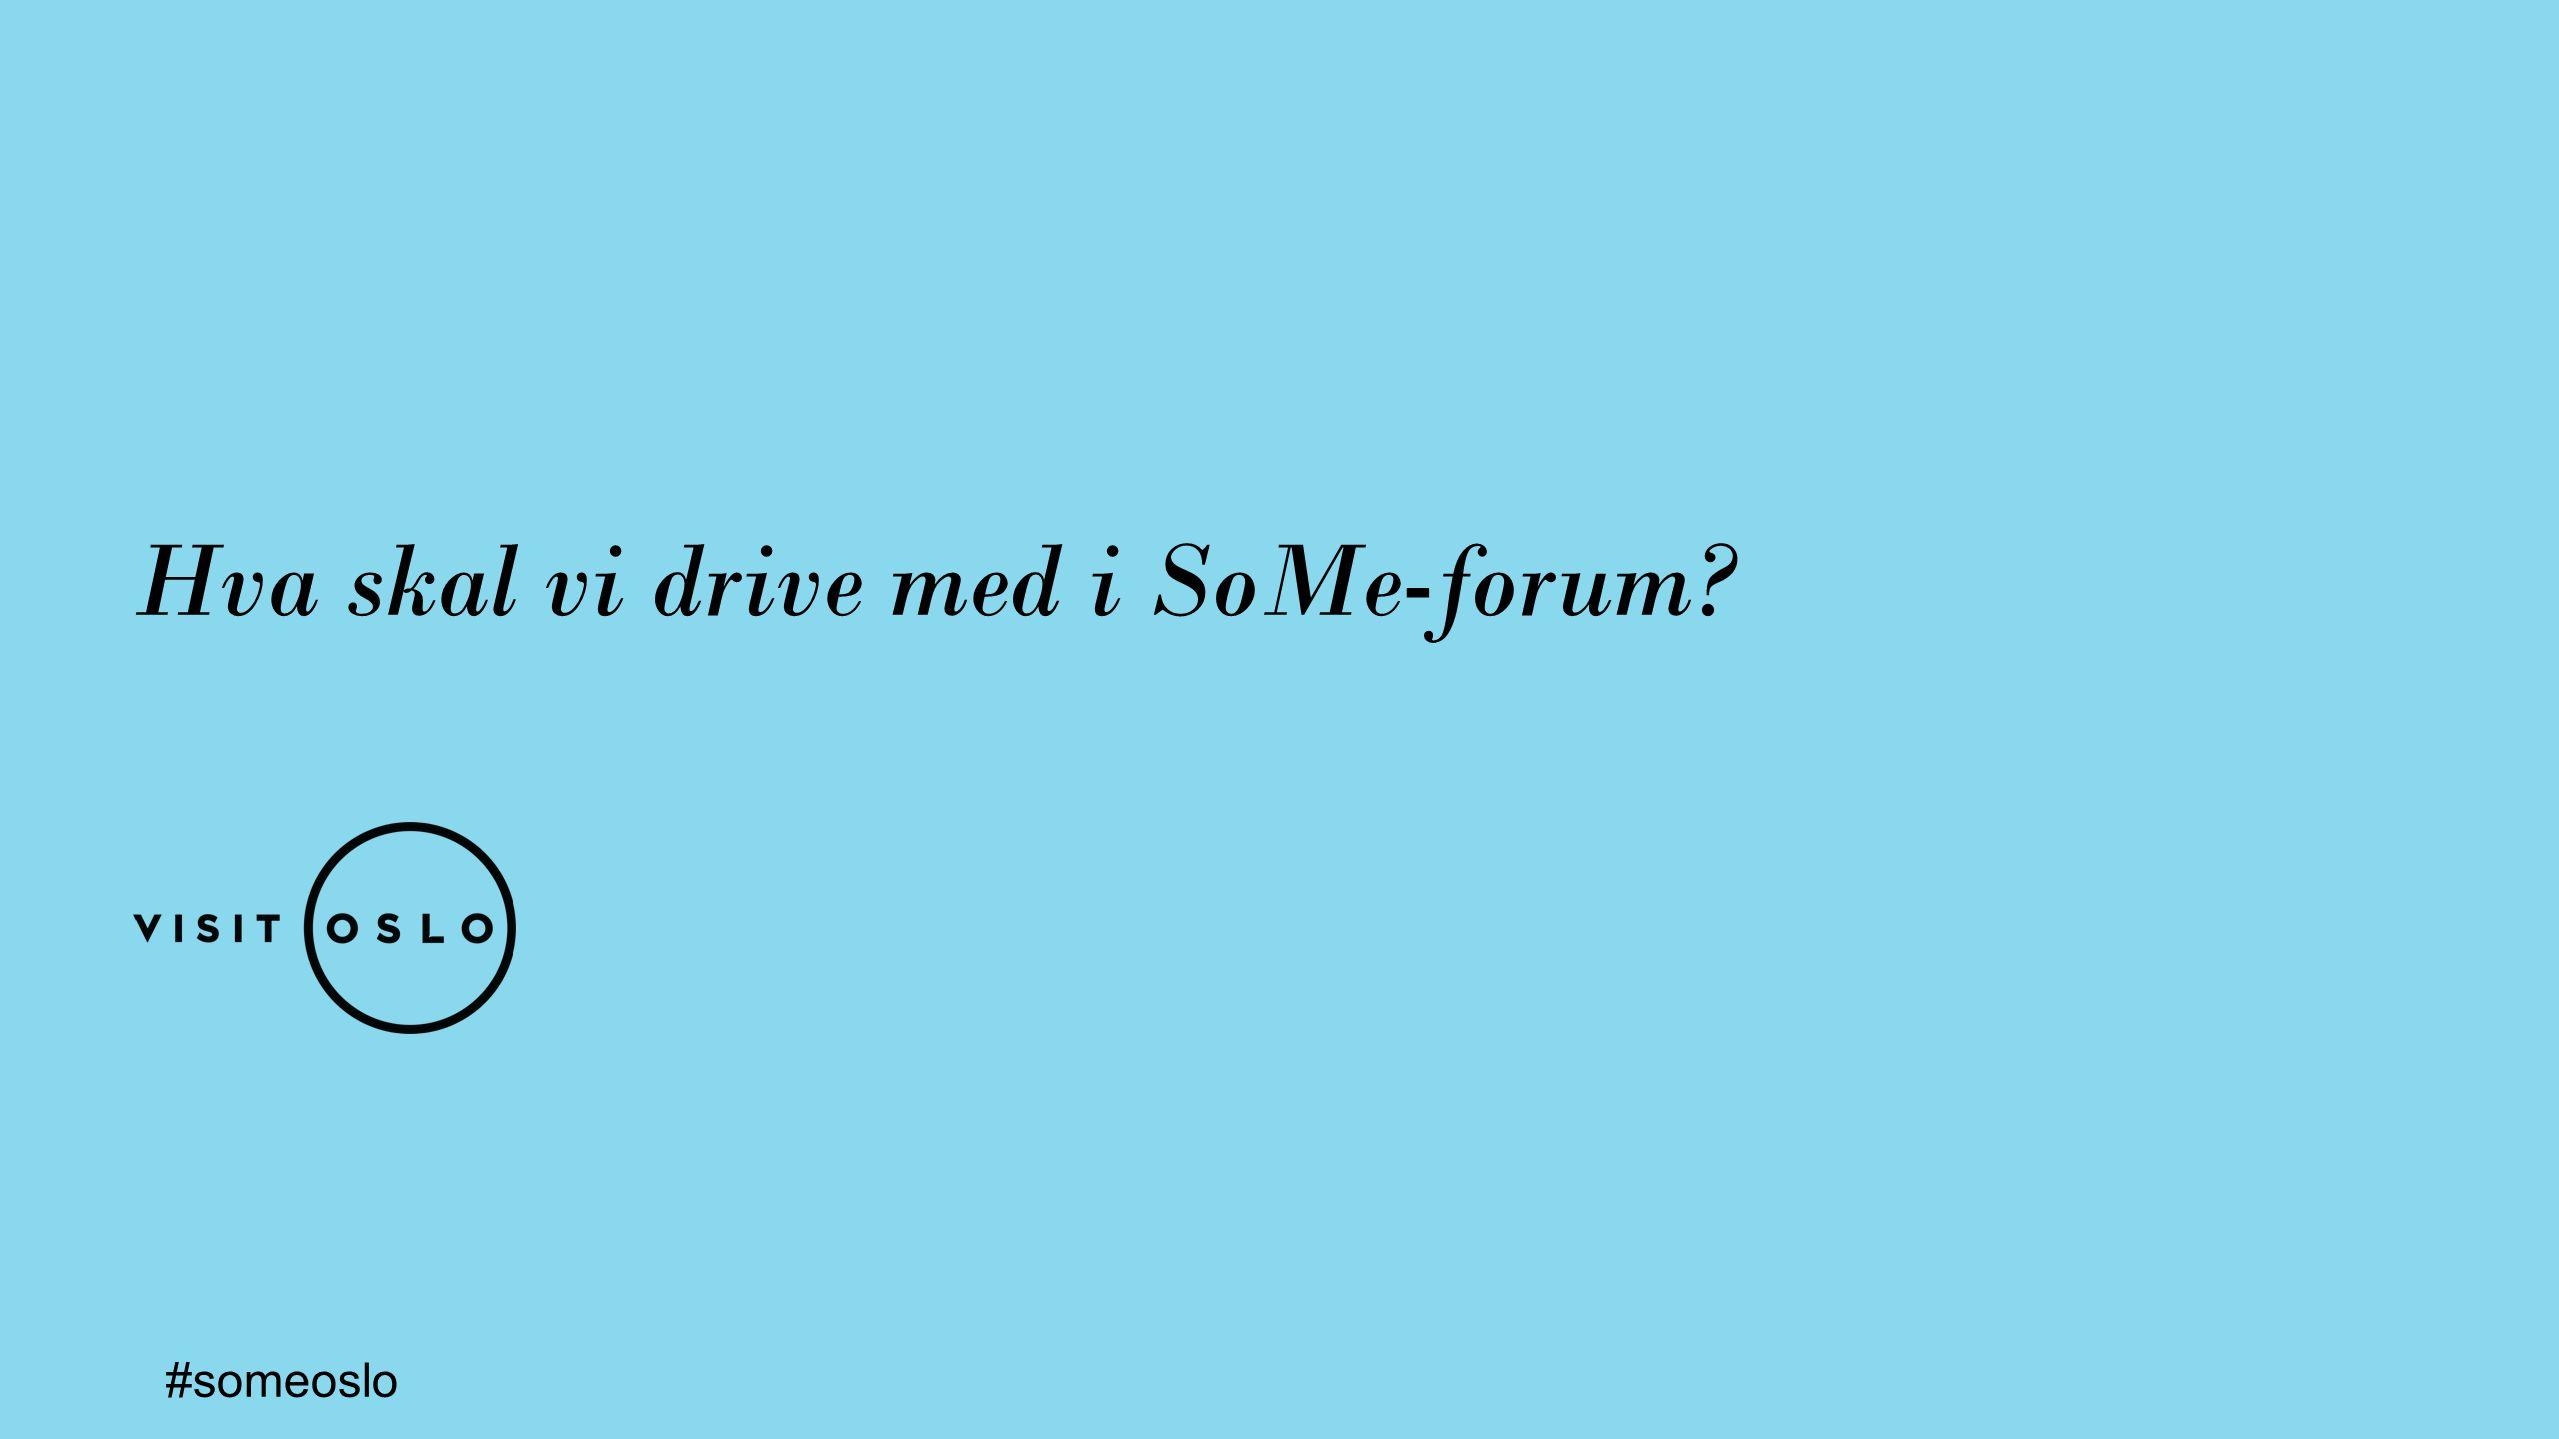 Hva skal vi drive med i SoMe-forum? #someoslo